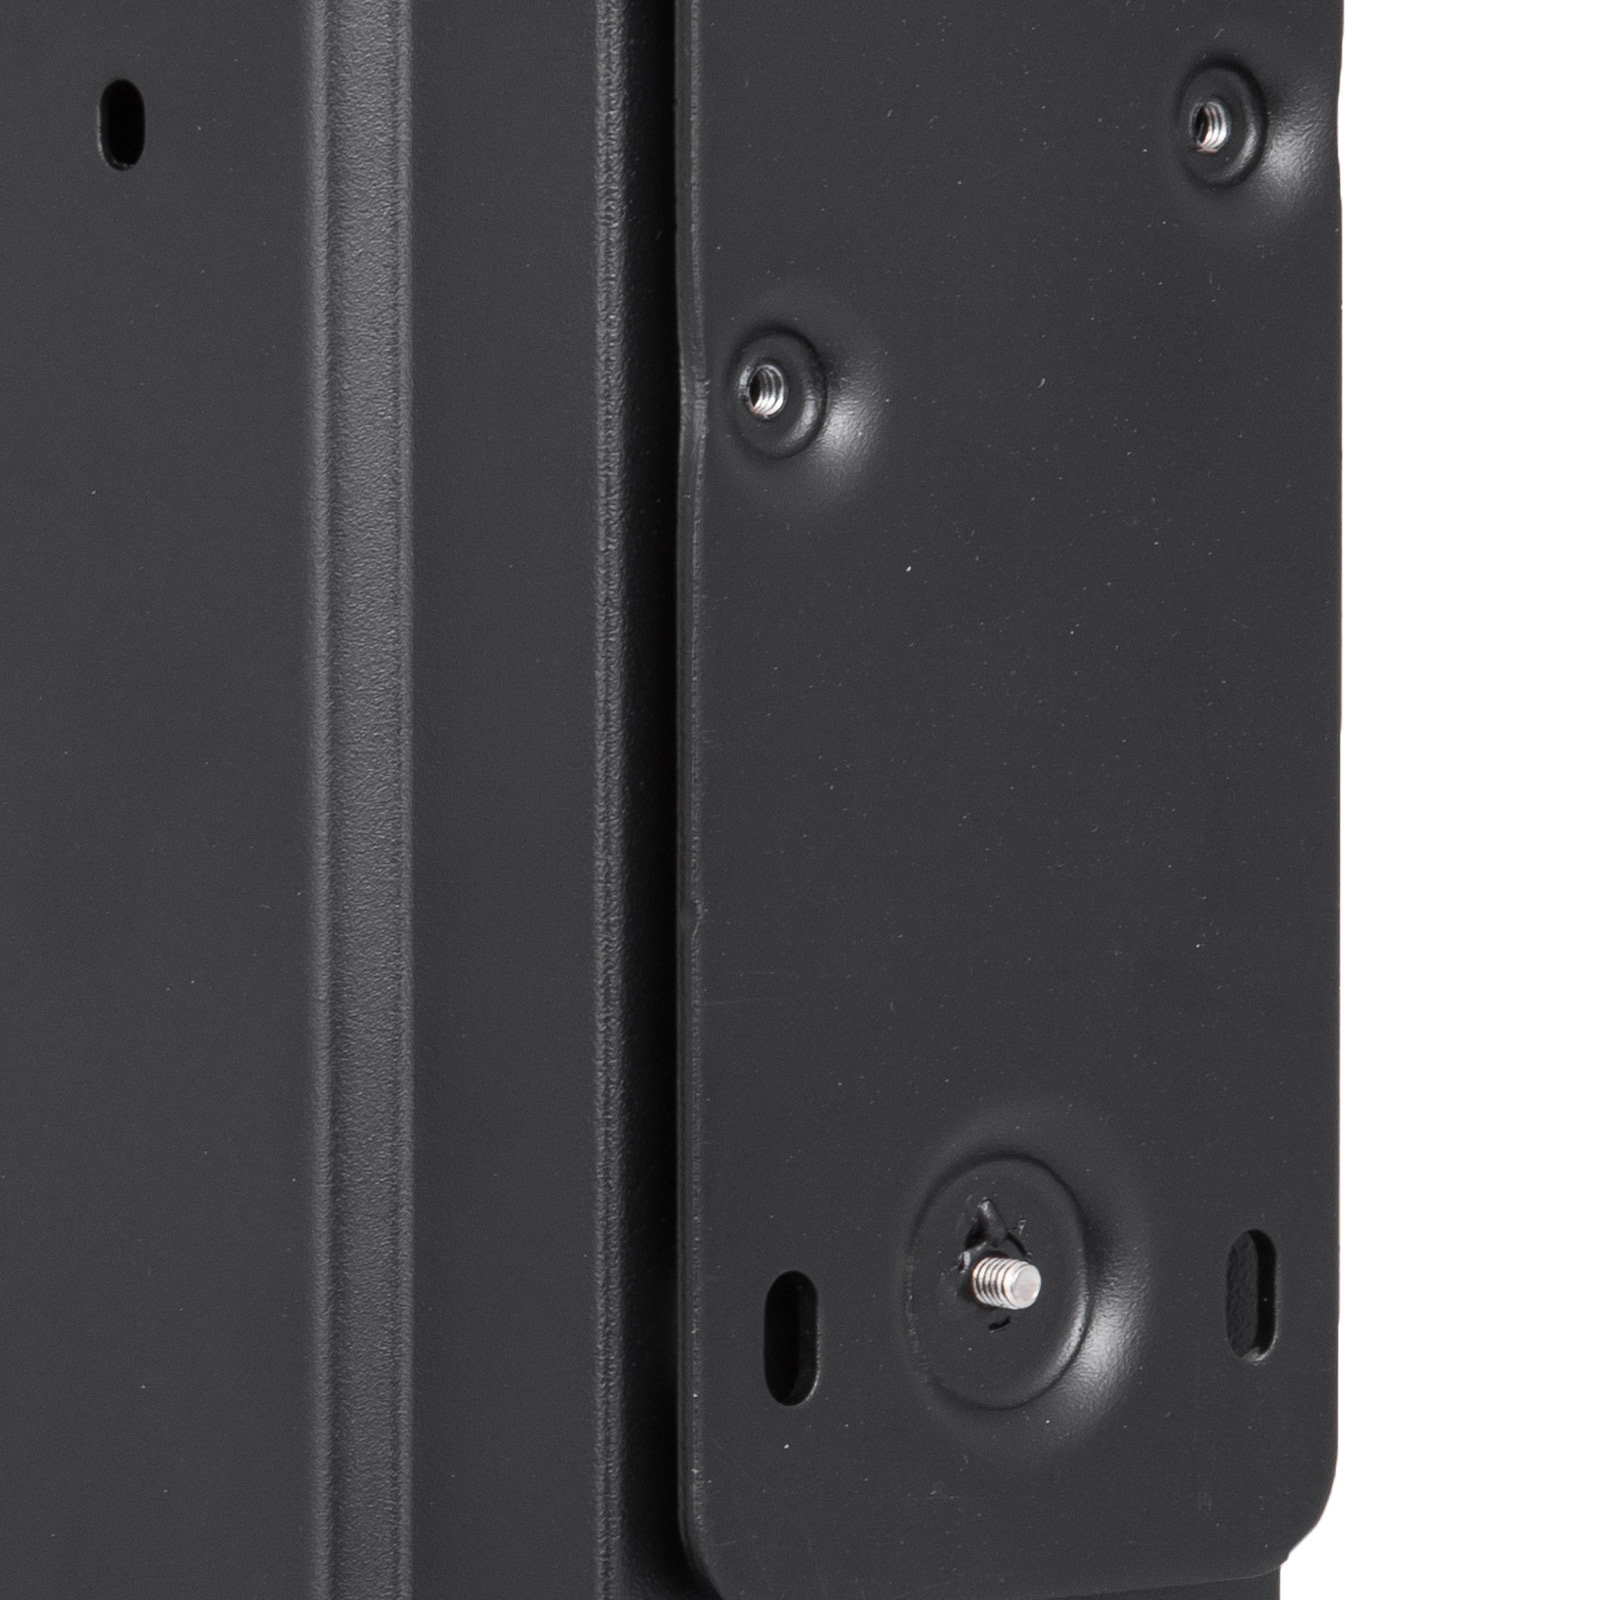 Pistol-Safe-Hand-Gun-Safe-Box-Biometric-Fingerprint-Storage-Home-Office-Security thumbnail 12